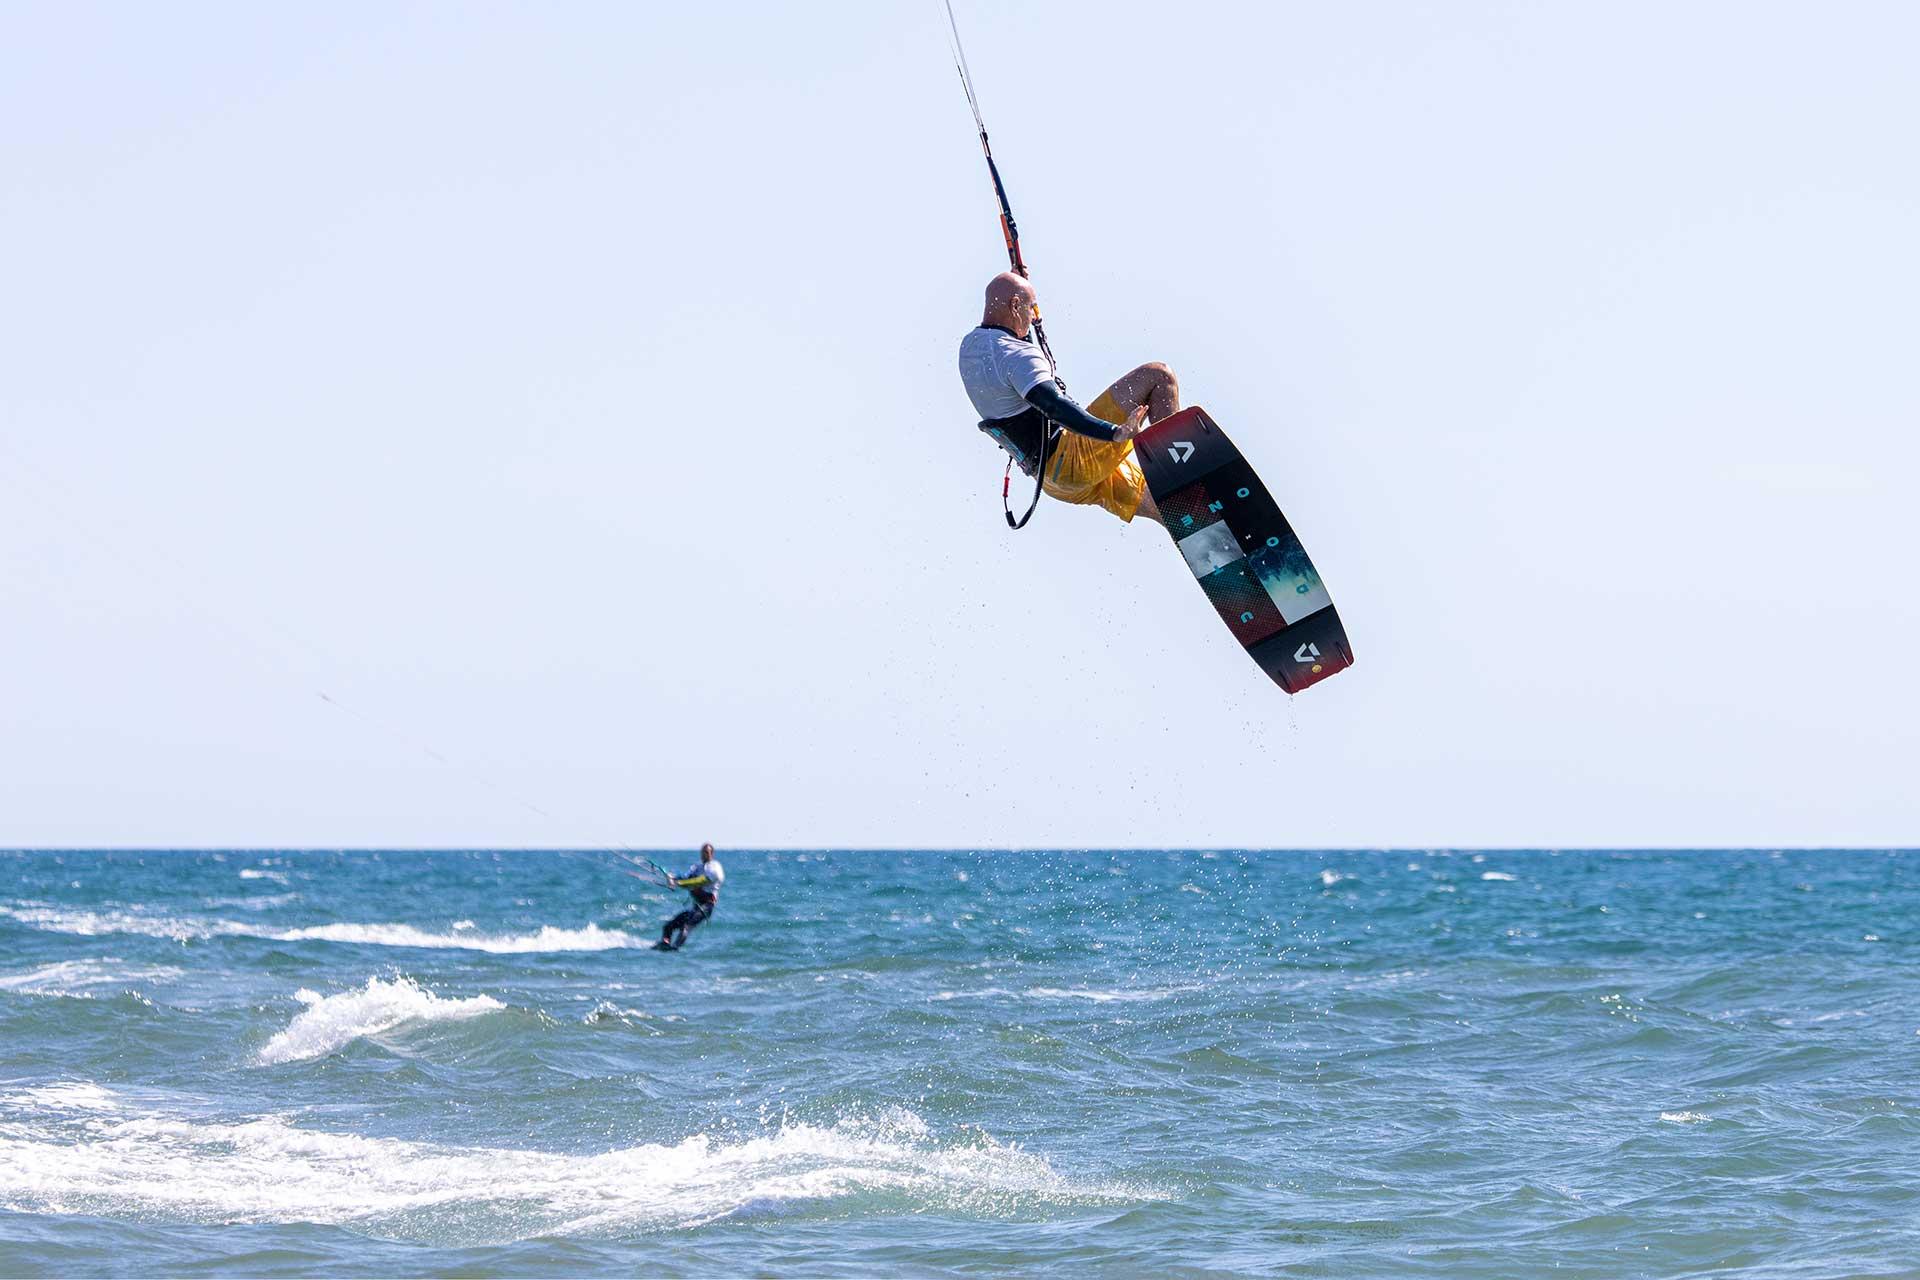 Scuola di kitesurf Roma Corsi lezioni kite